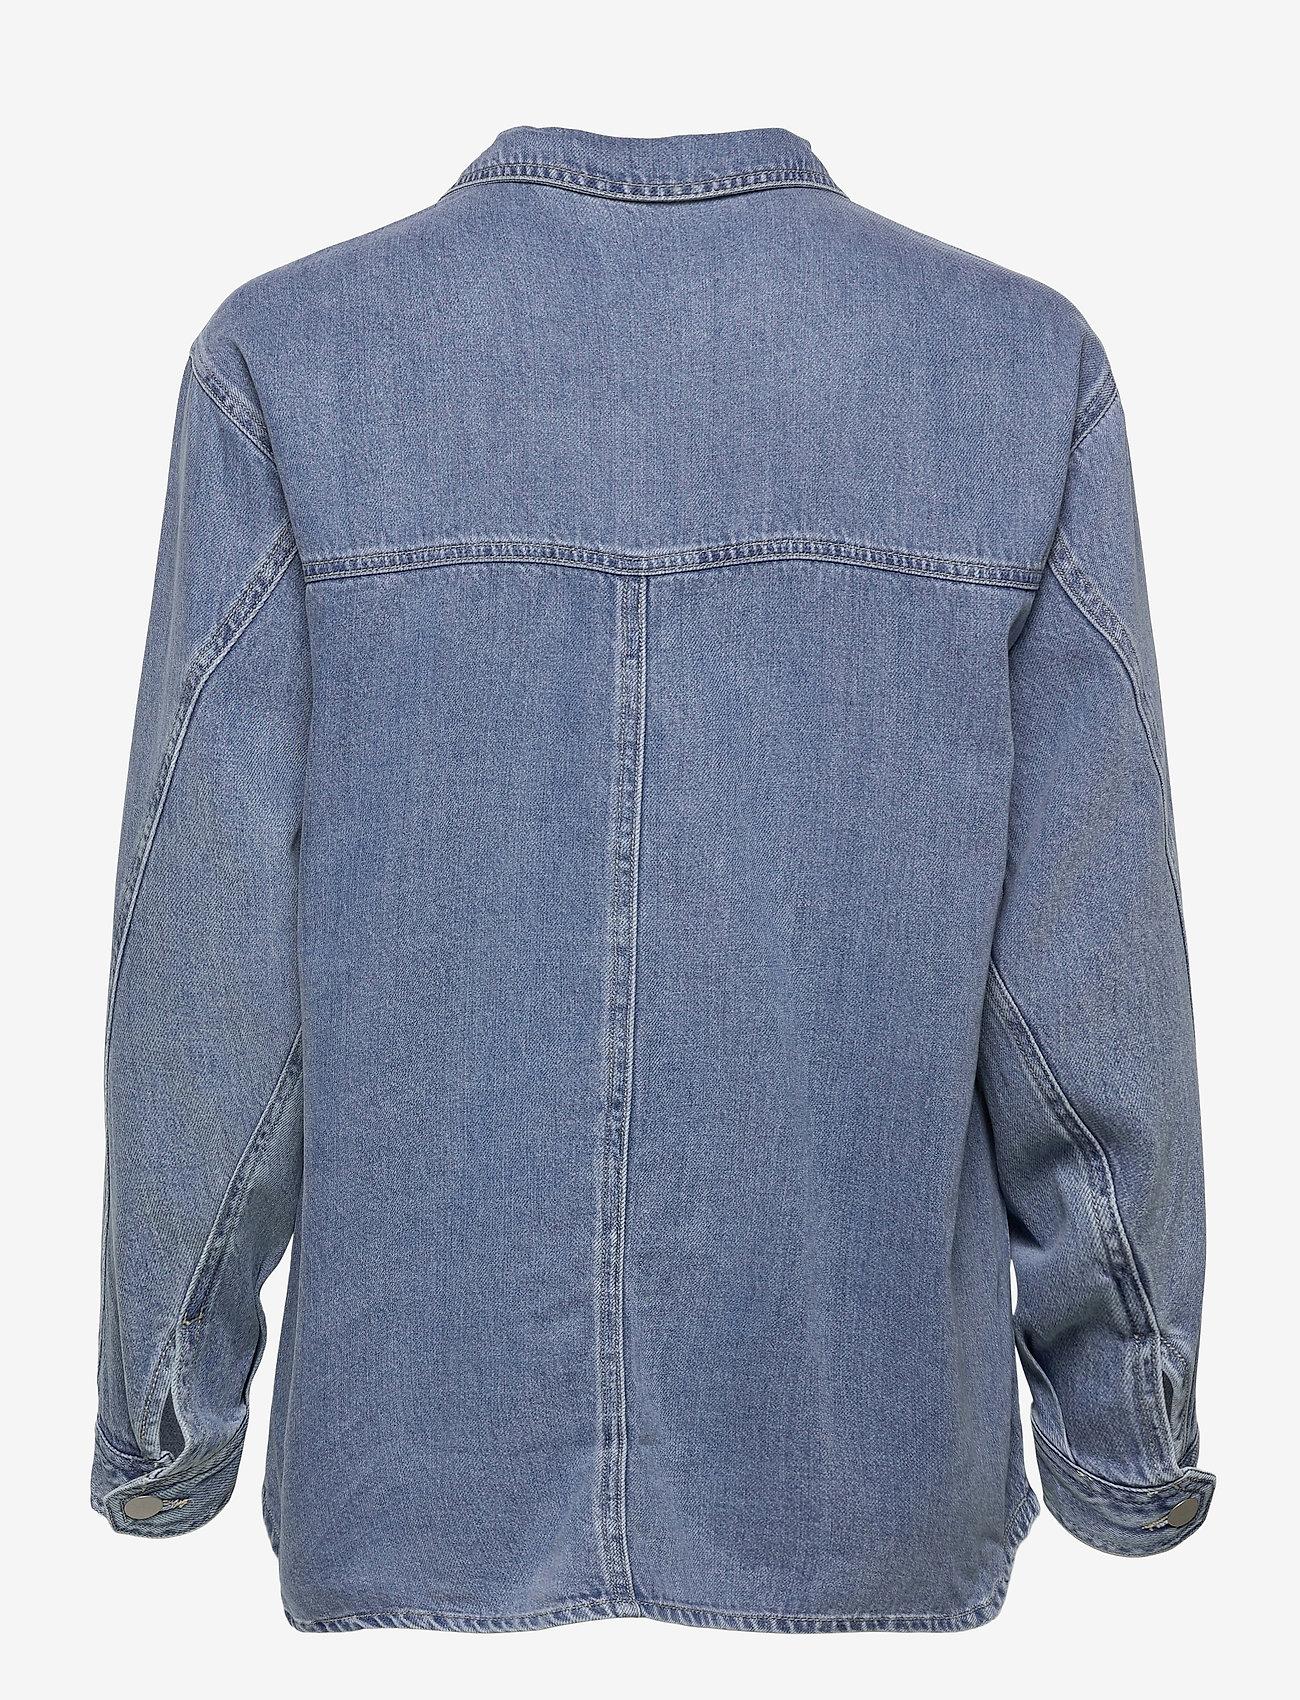 Vero Moda - VMEMERY LS OVERSIZE DENIM SHIRT VMA - kläder - light blue denim - 1